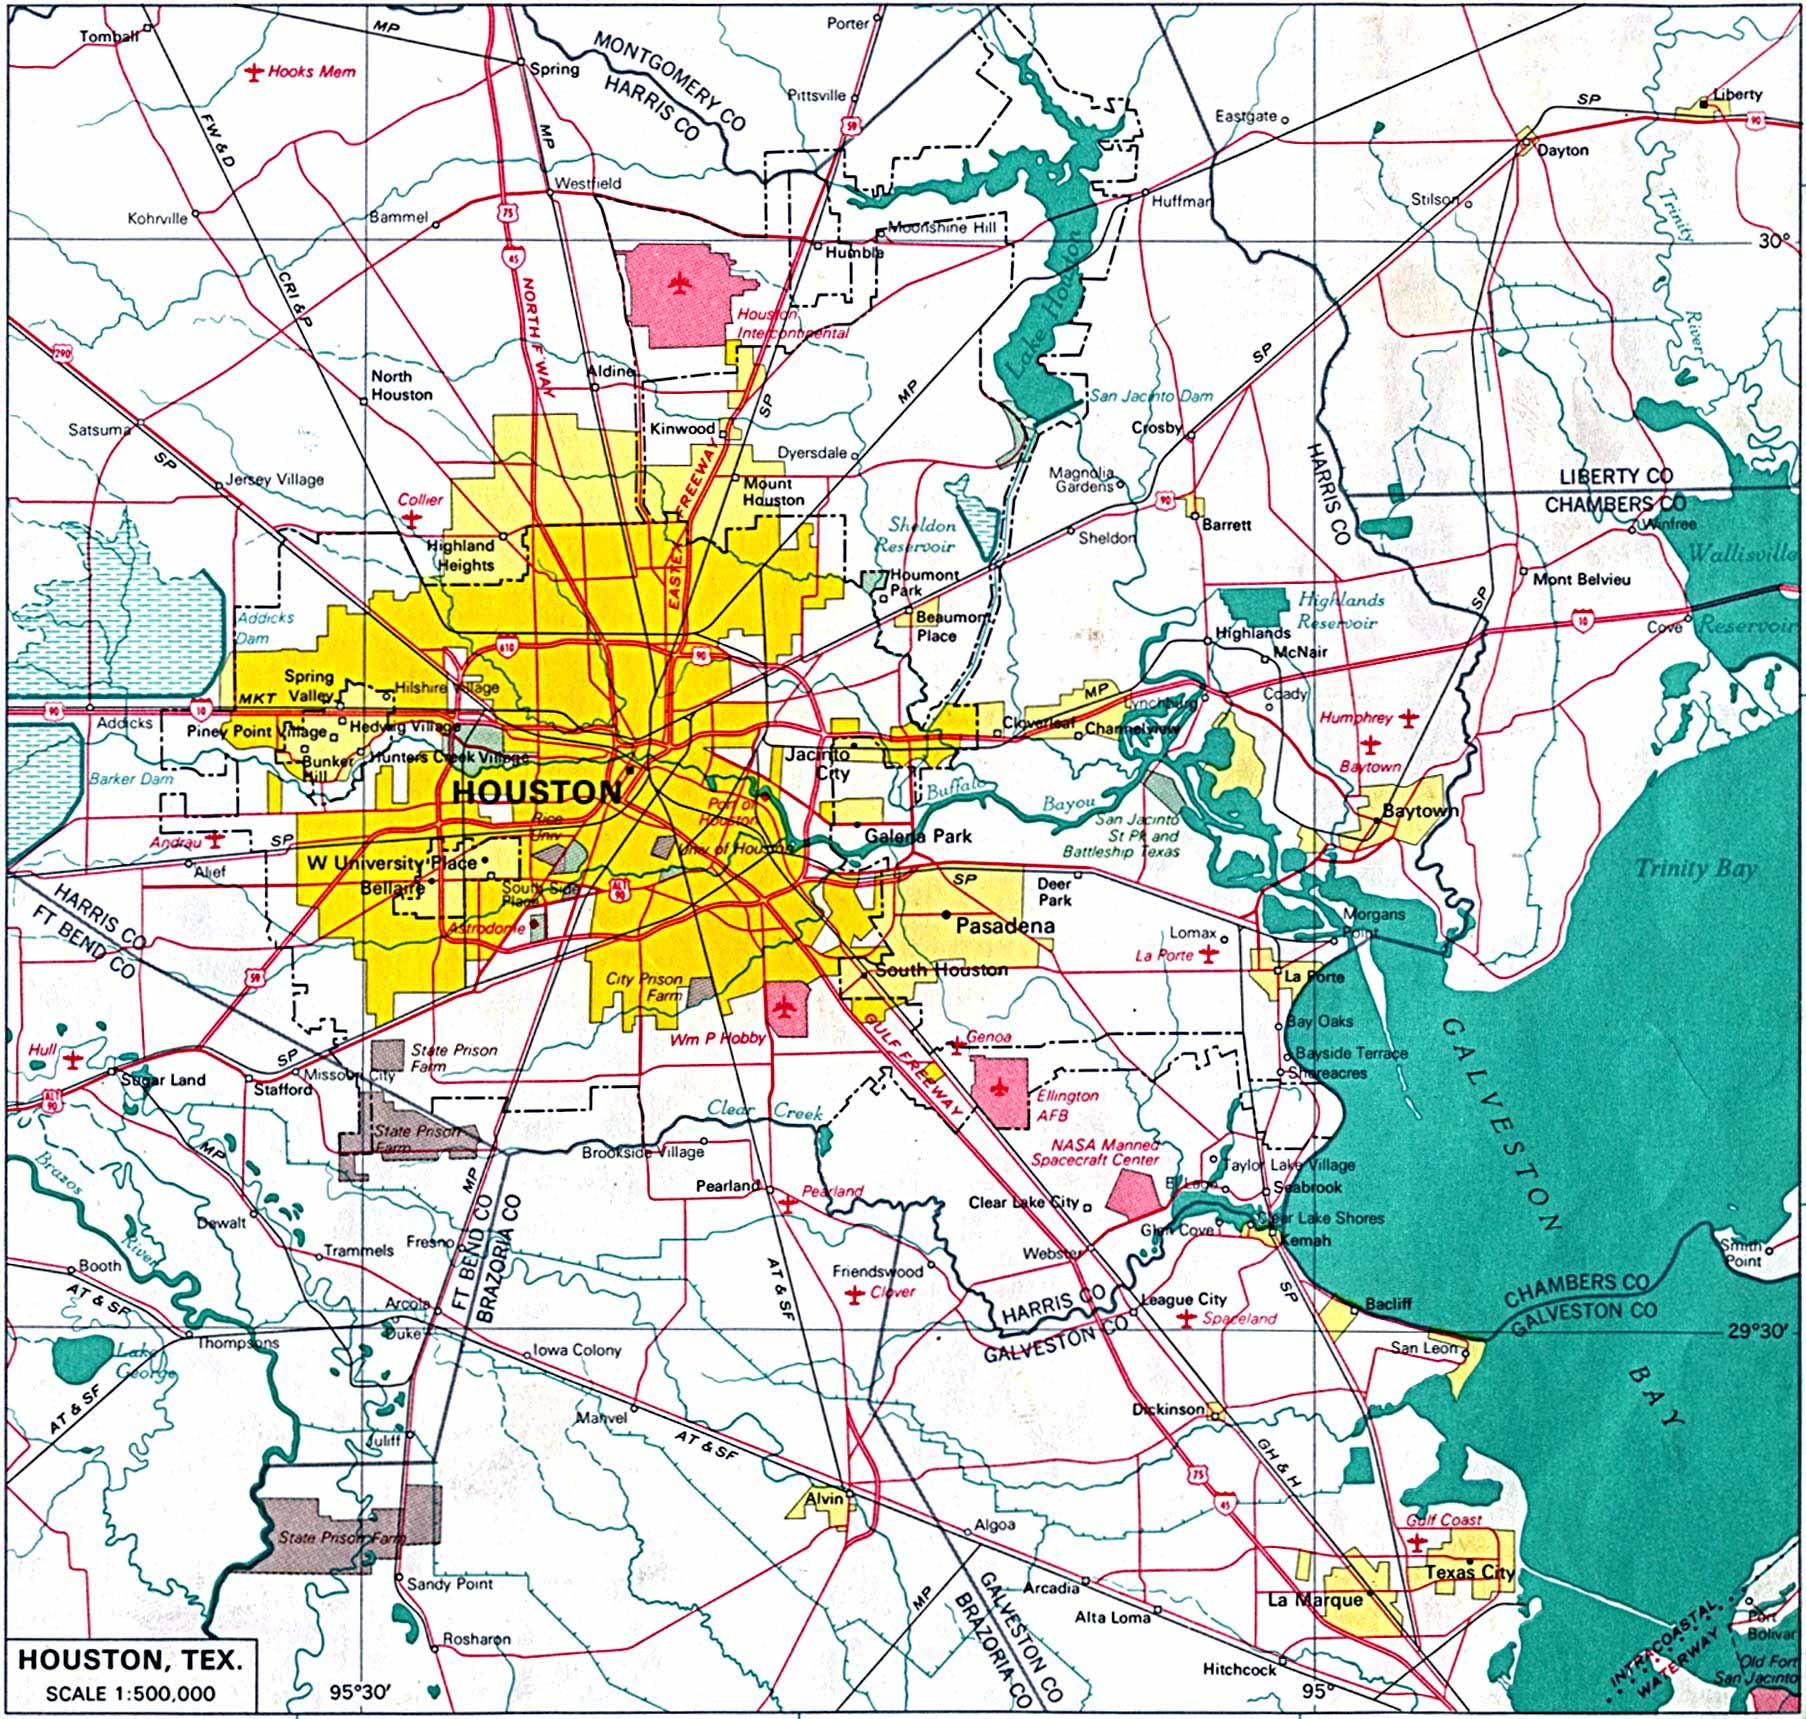 Harris County Texas Map Harris County Texas Map | Business Ideas 2013 Harris County Texas Map